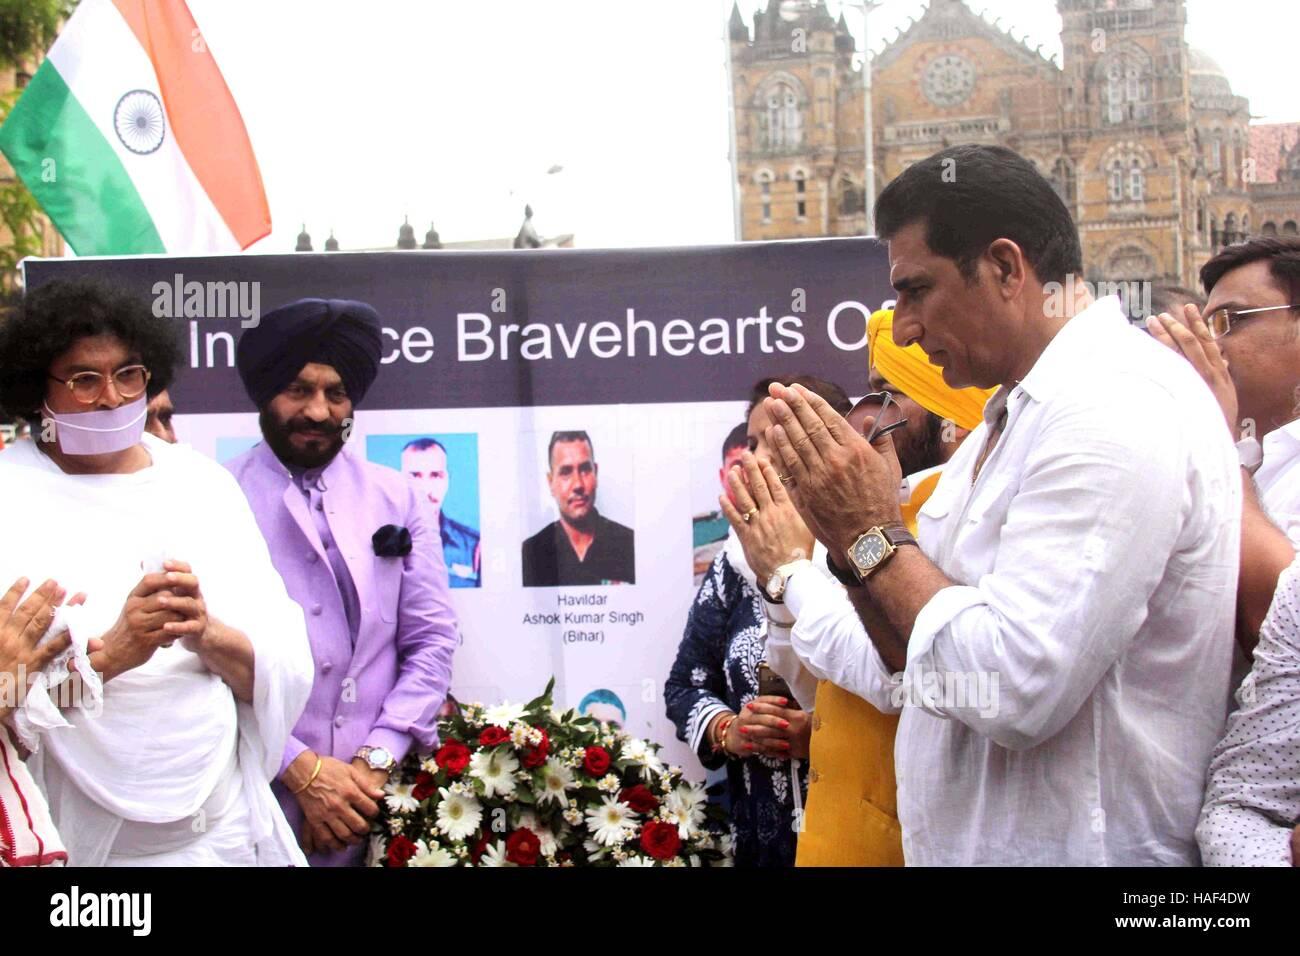 Acharya Dr. Lokesh Muni Ji M S All India Bitta Ant Mukesh terroristas Rishi pagar tributo a los soldados indios Foto de stock